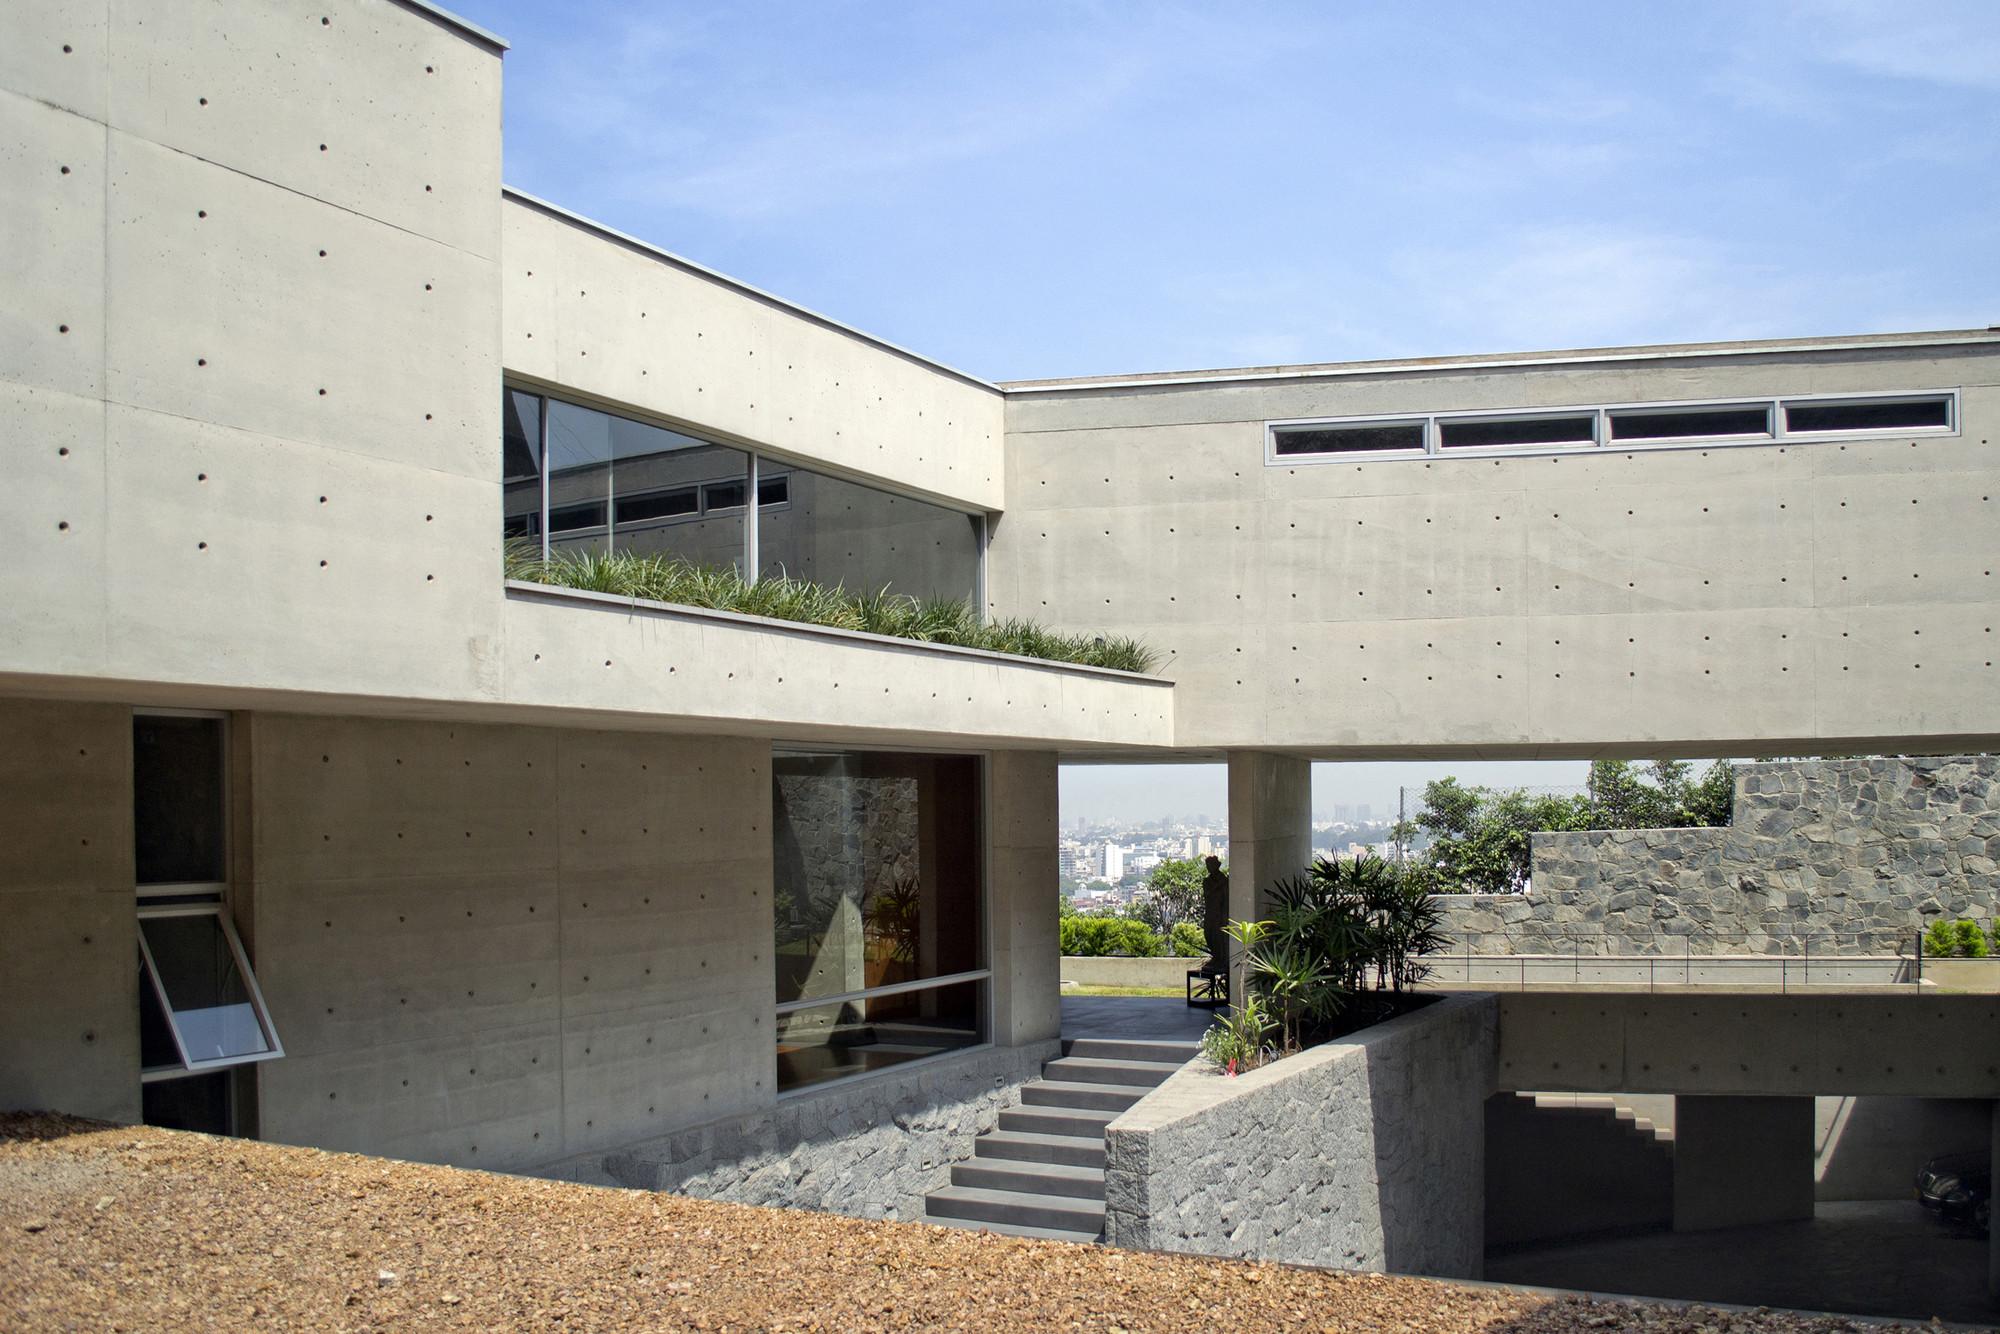 House on the Hillside / Benavides & Watmough arquitectos, © Stella Watmough